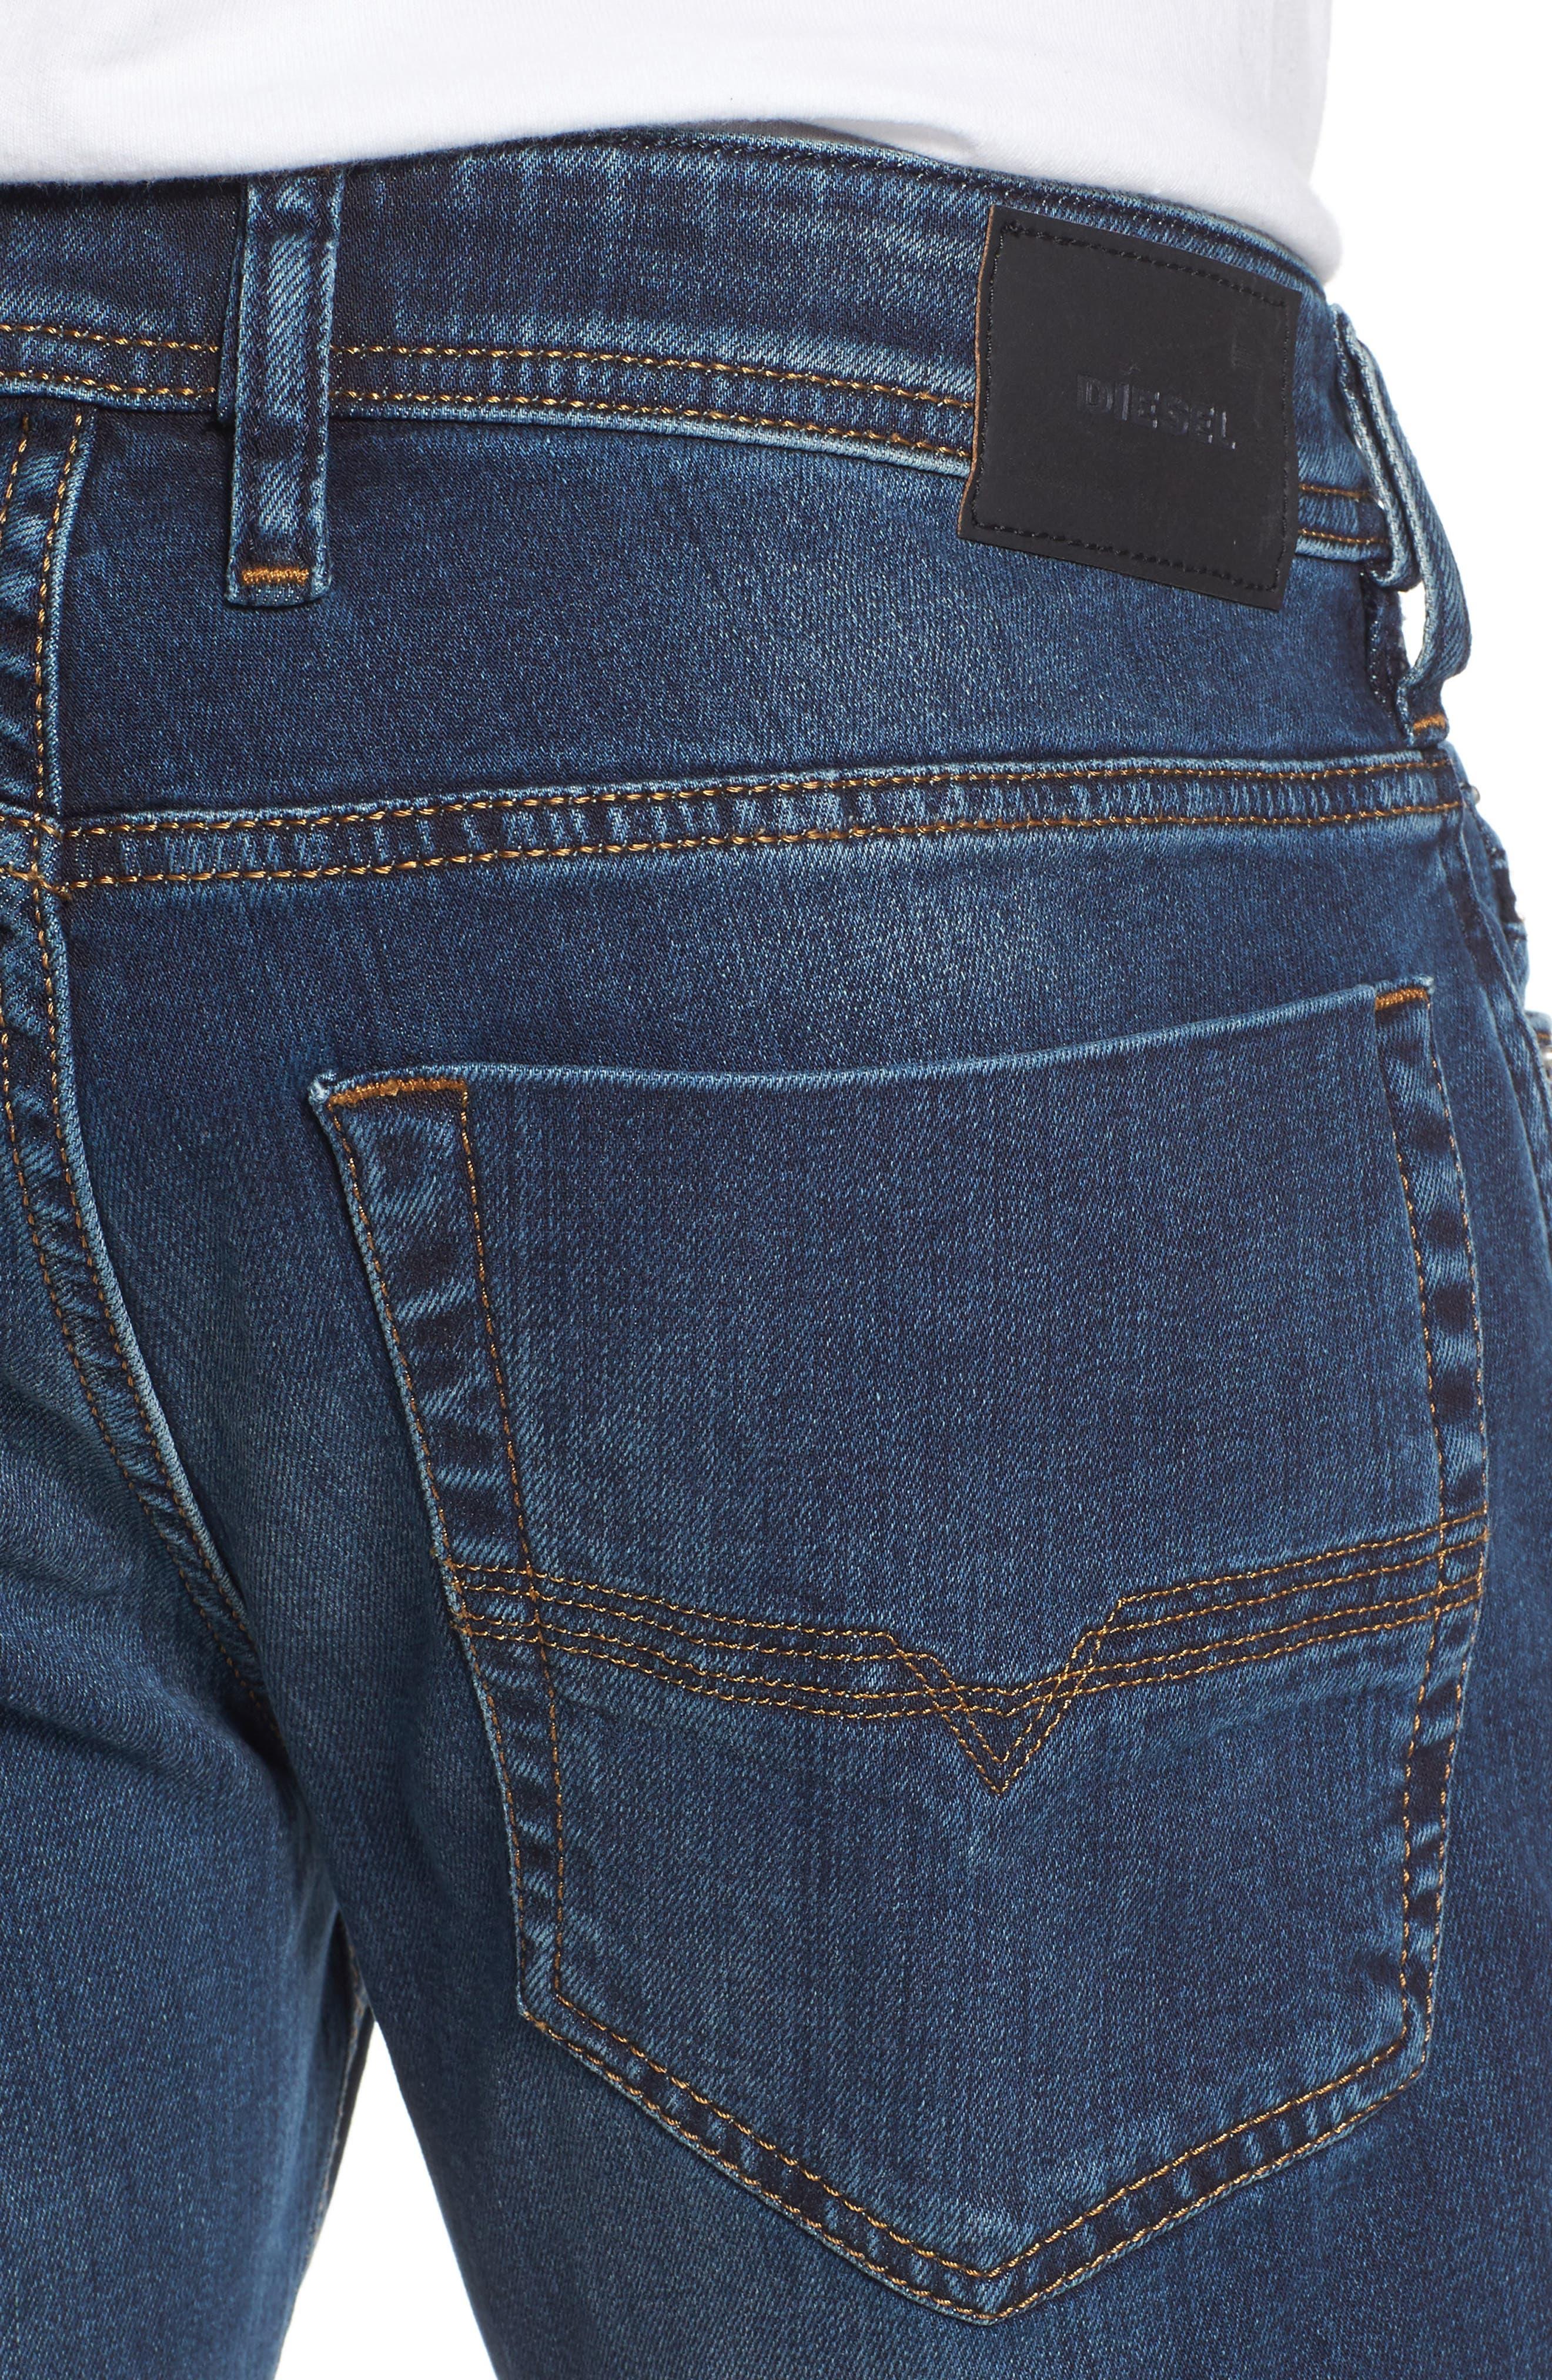 Zatiny Bootcut Jeans,                             Alternate thumbnail 4, color,                             084BU